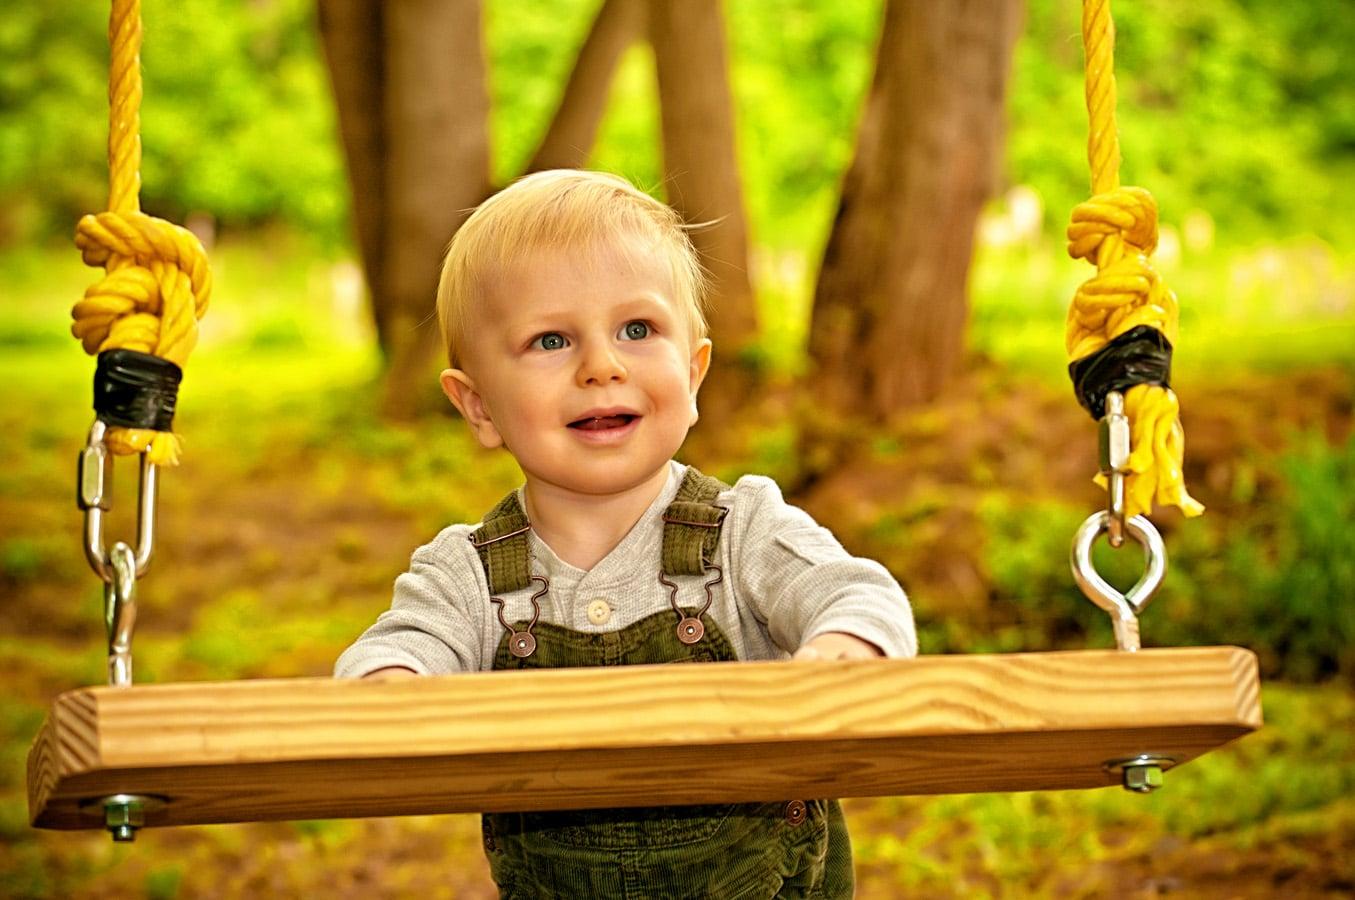 child, portrait, swing, outdoor, natural light, Northern VA